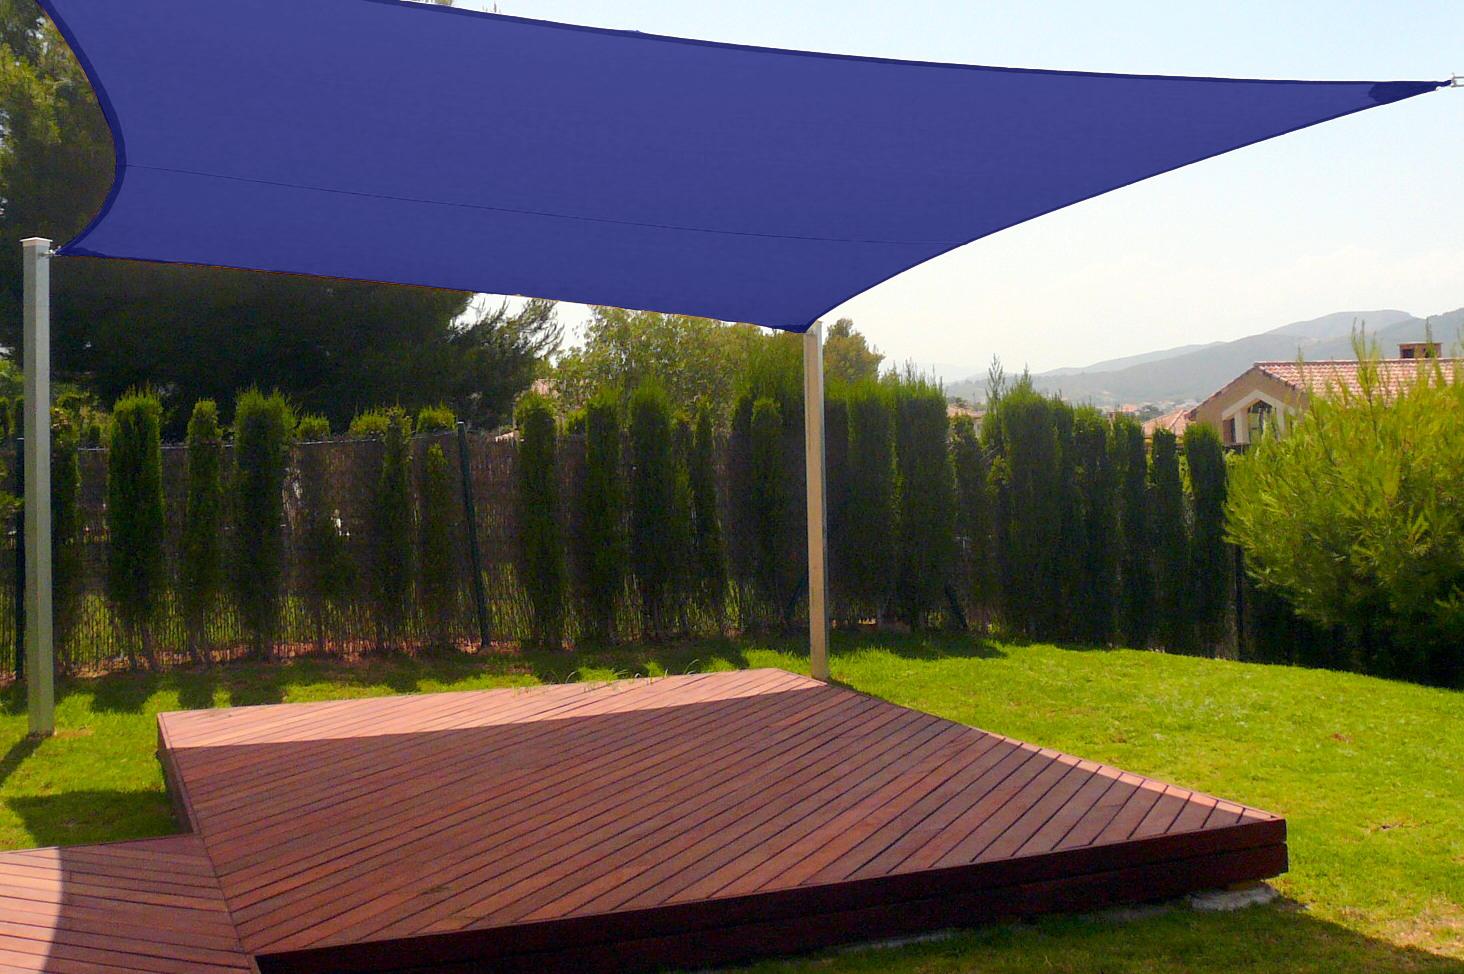 New premium clevr sun shade canopy sail 12 39 x12 39 square uv for Sun patio